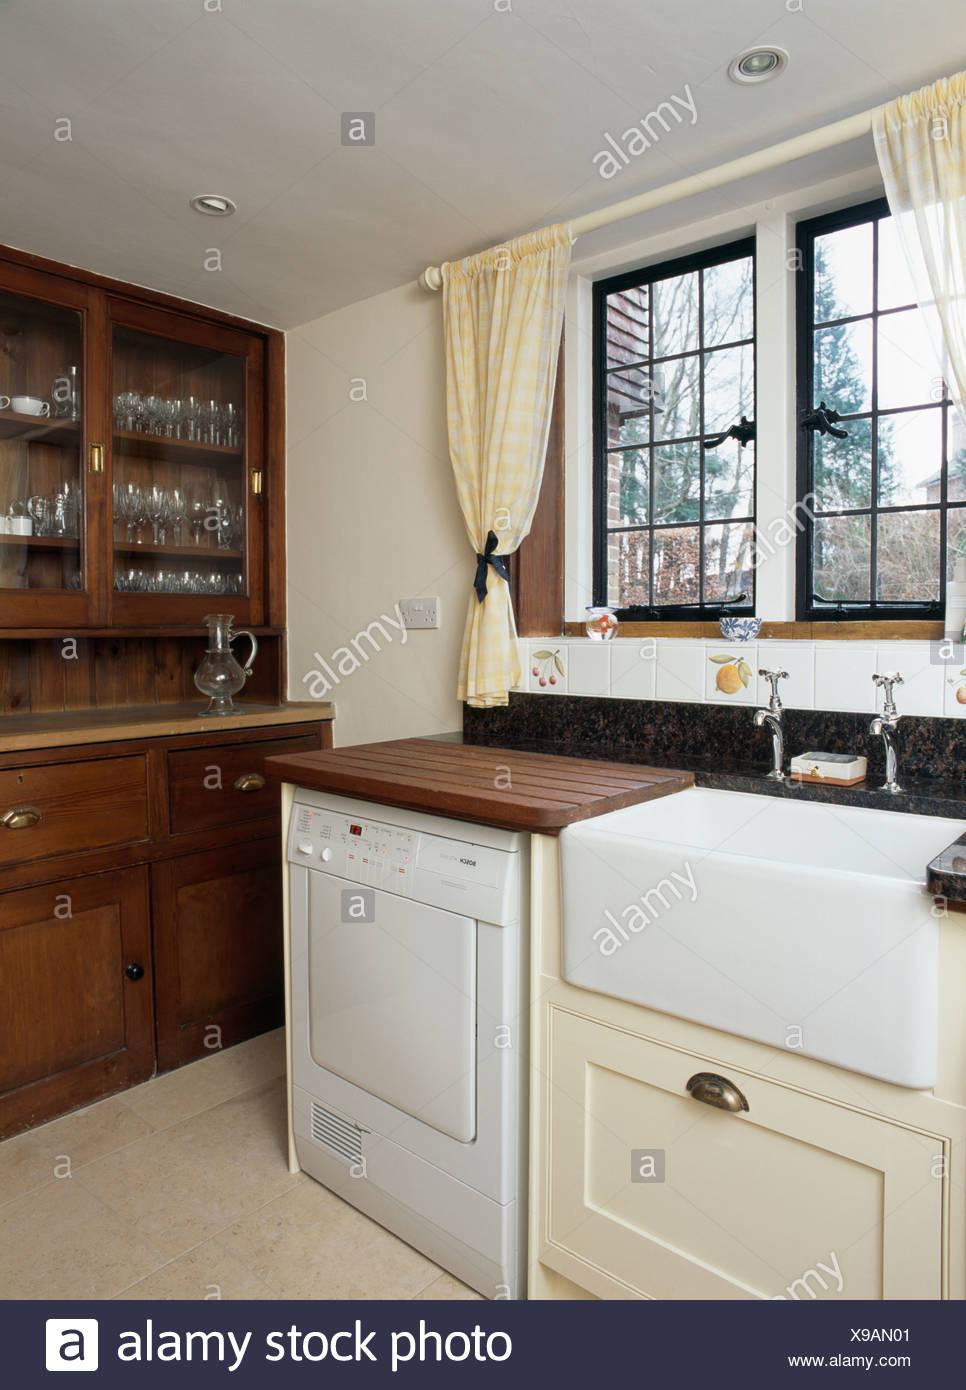 Appliances Dishwashers Stockfotos & Appliances Dishwashers Bilder ...